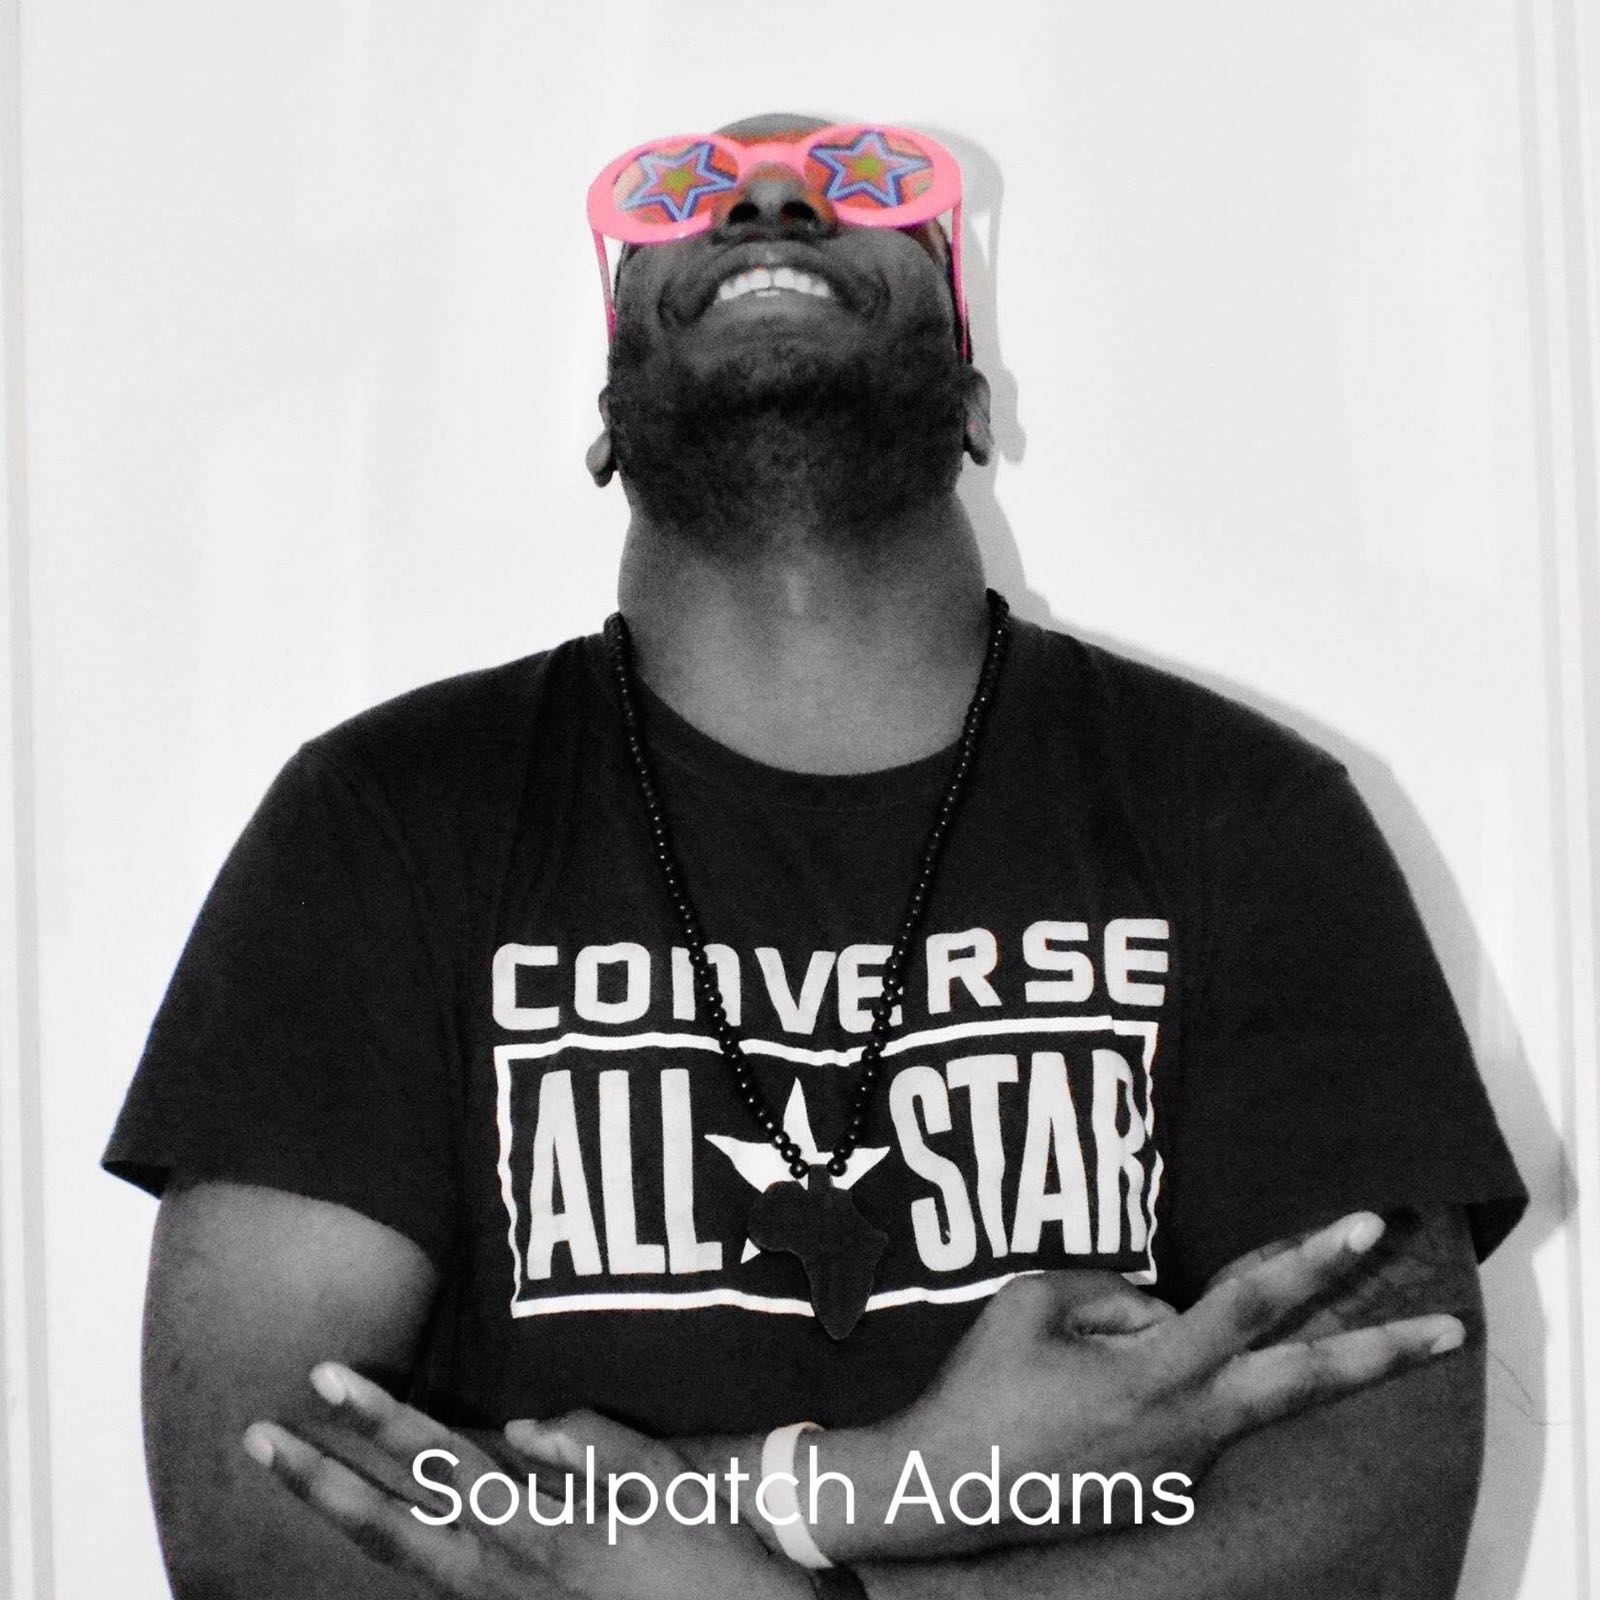 Soulpatch Adams